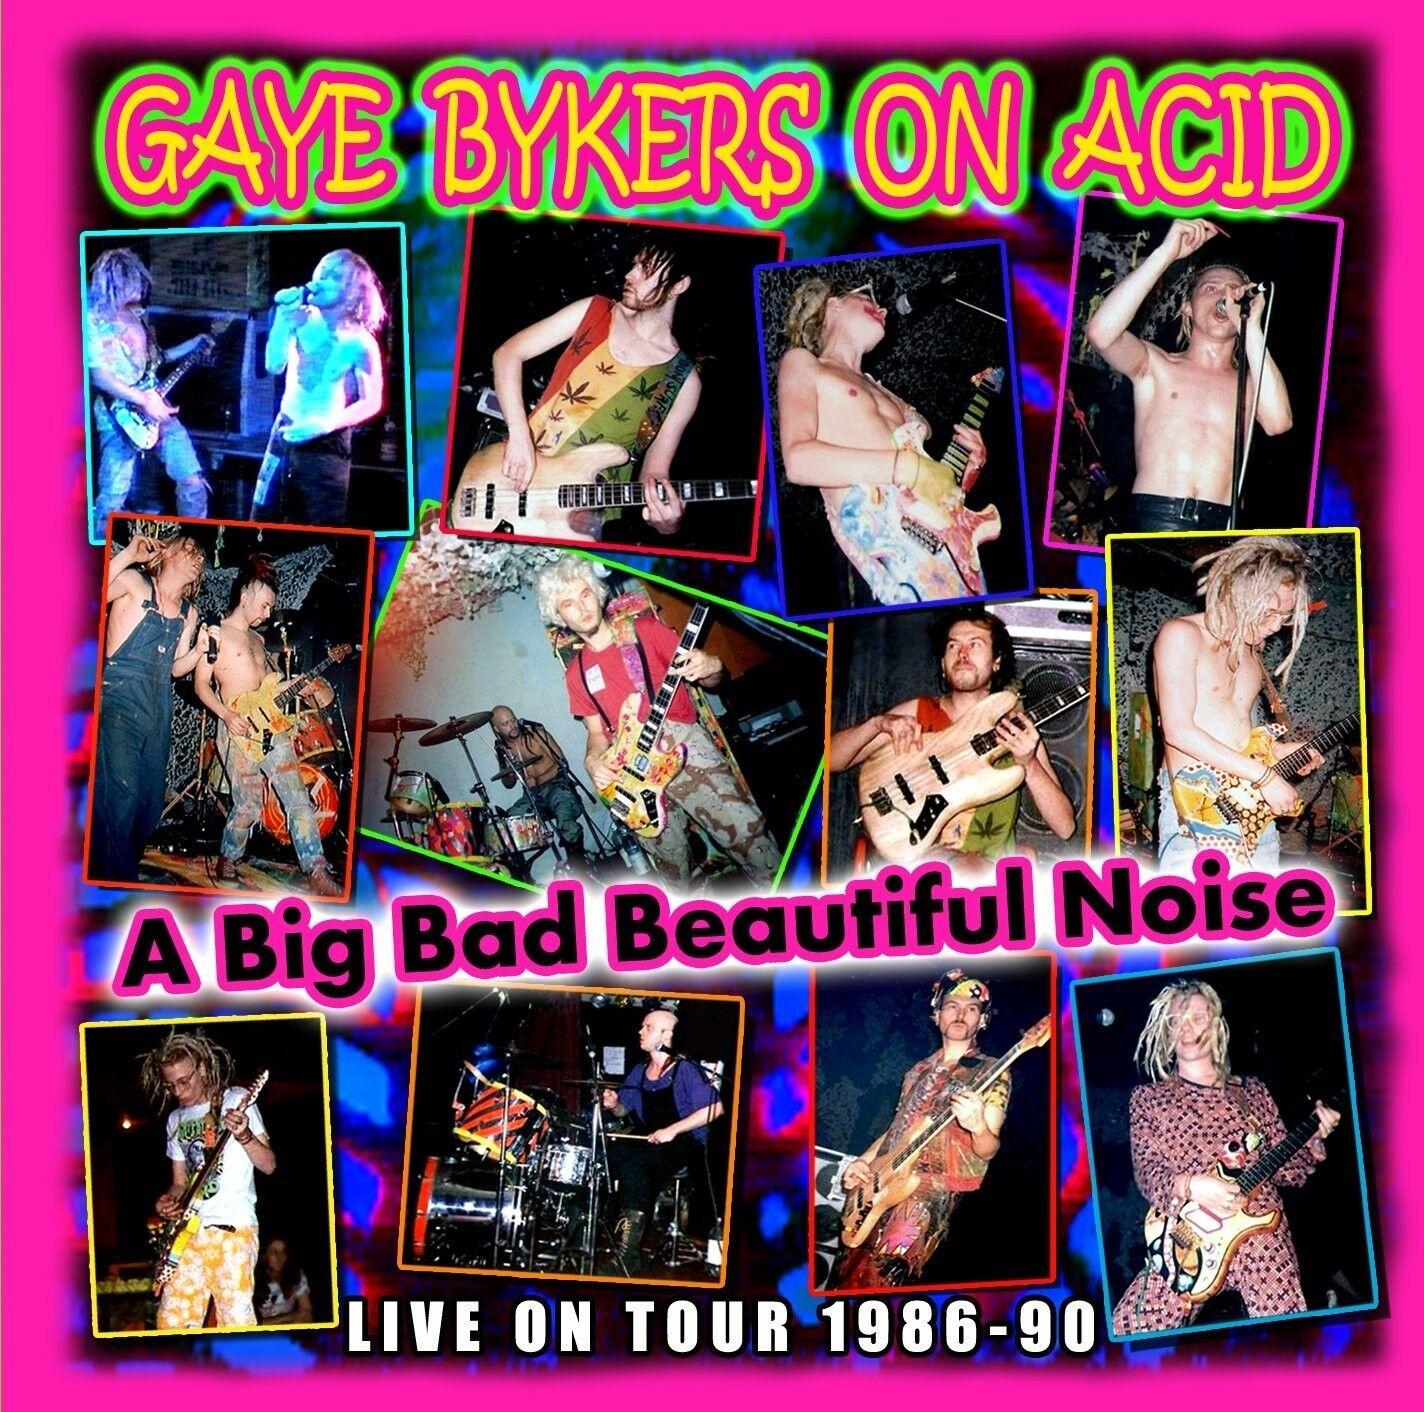 A Big Bad Beautiful Noize (Live 1986-90) - Gaye Bykers On Acid [Cd] 0